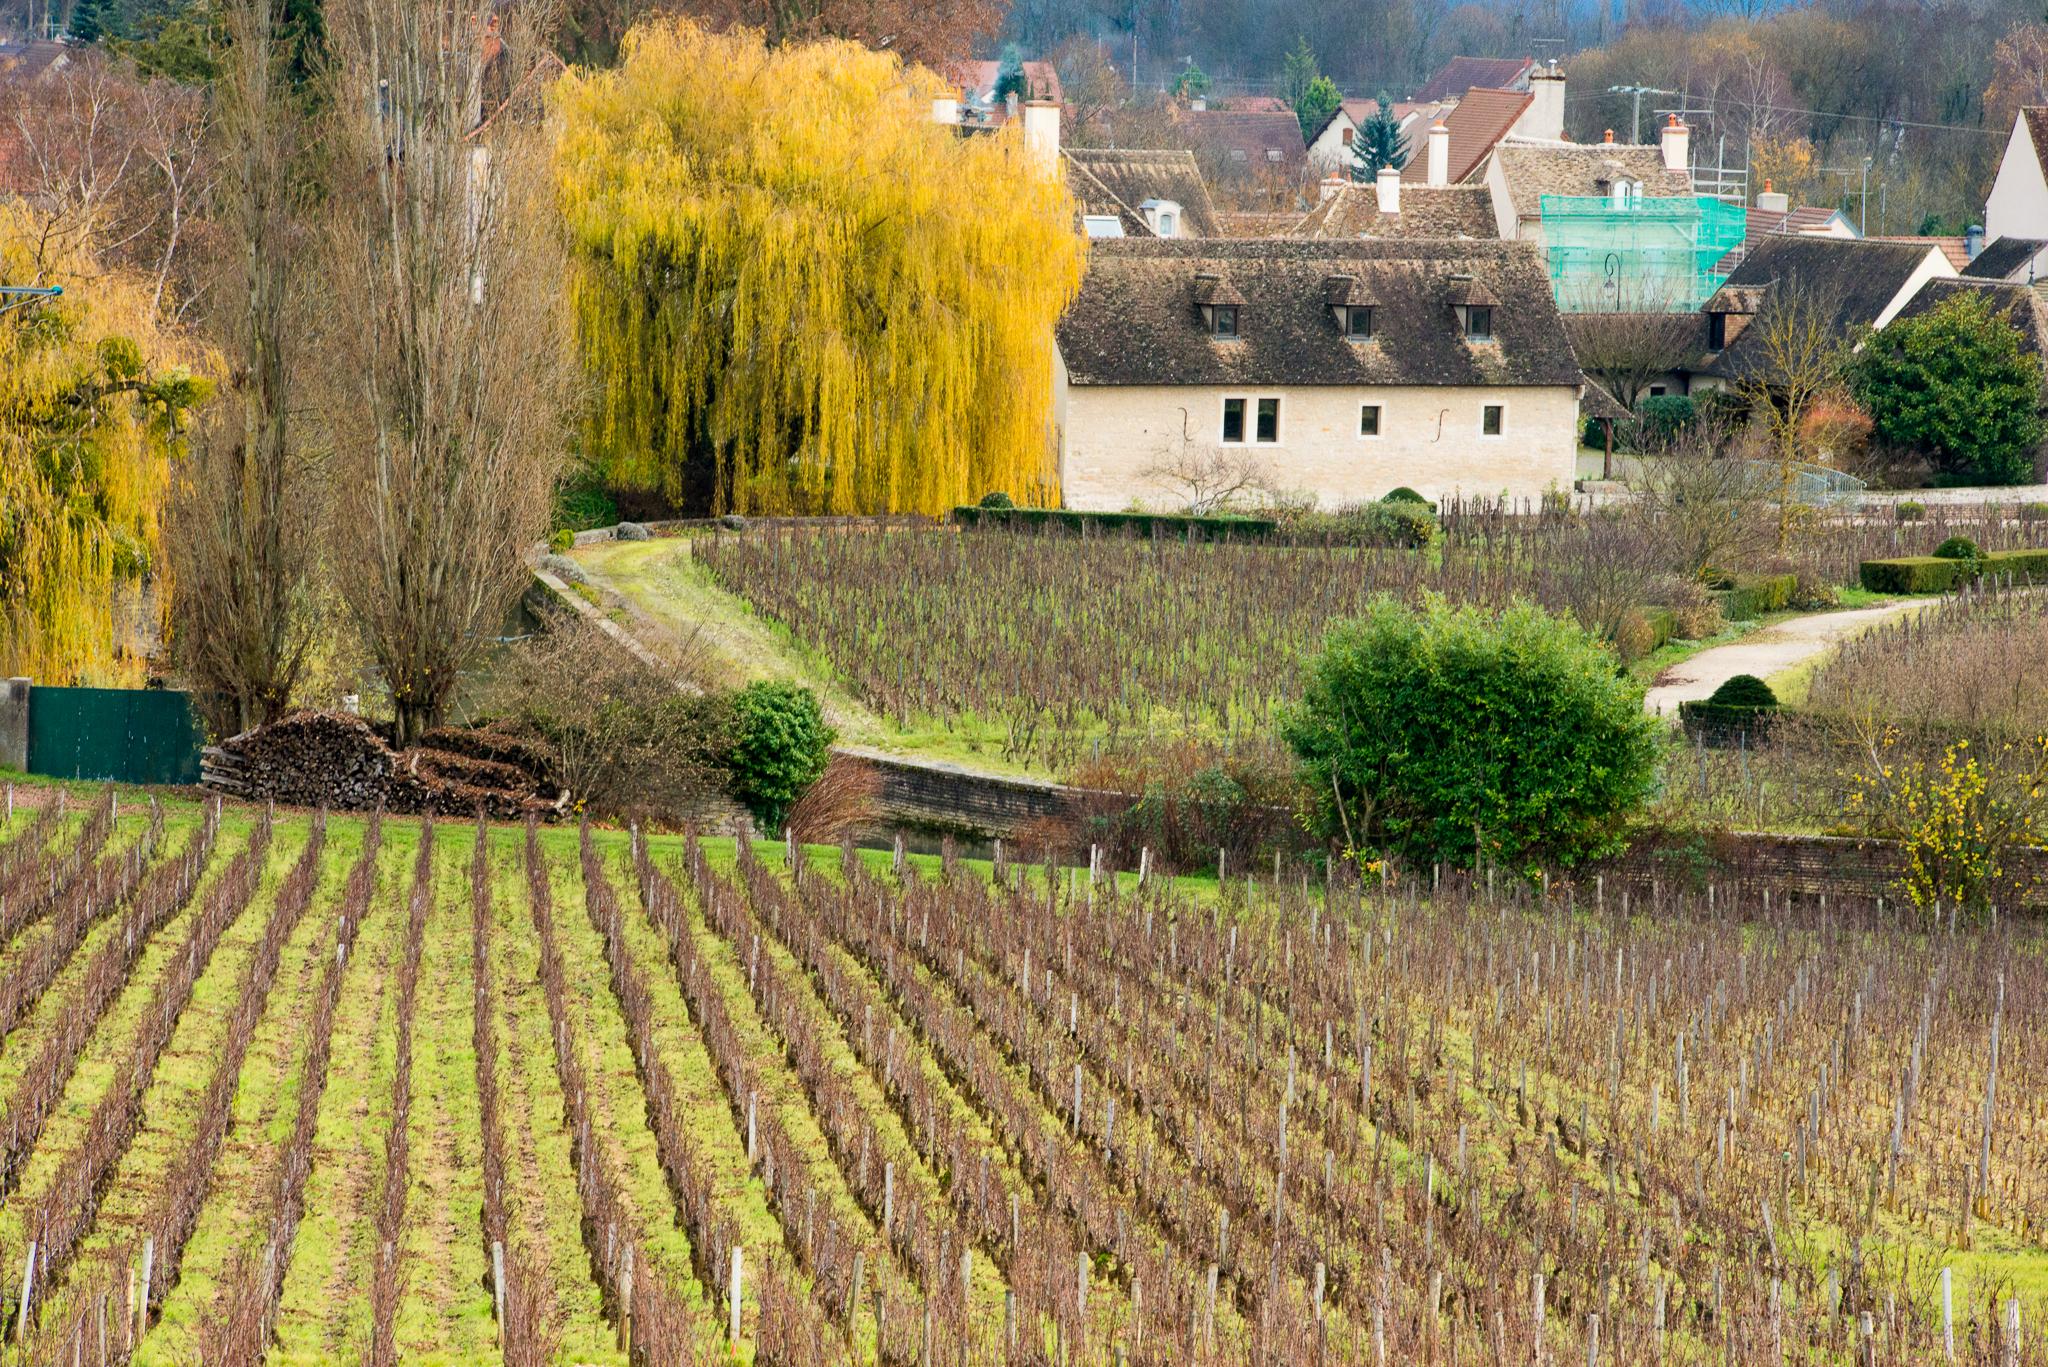 Jason-Davis-Images-Burgundy-0096.jpg